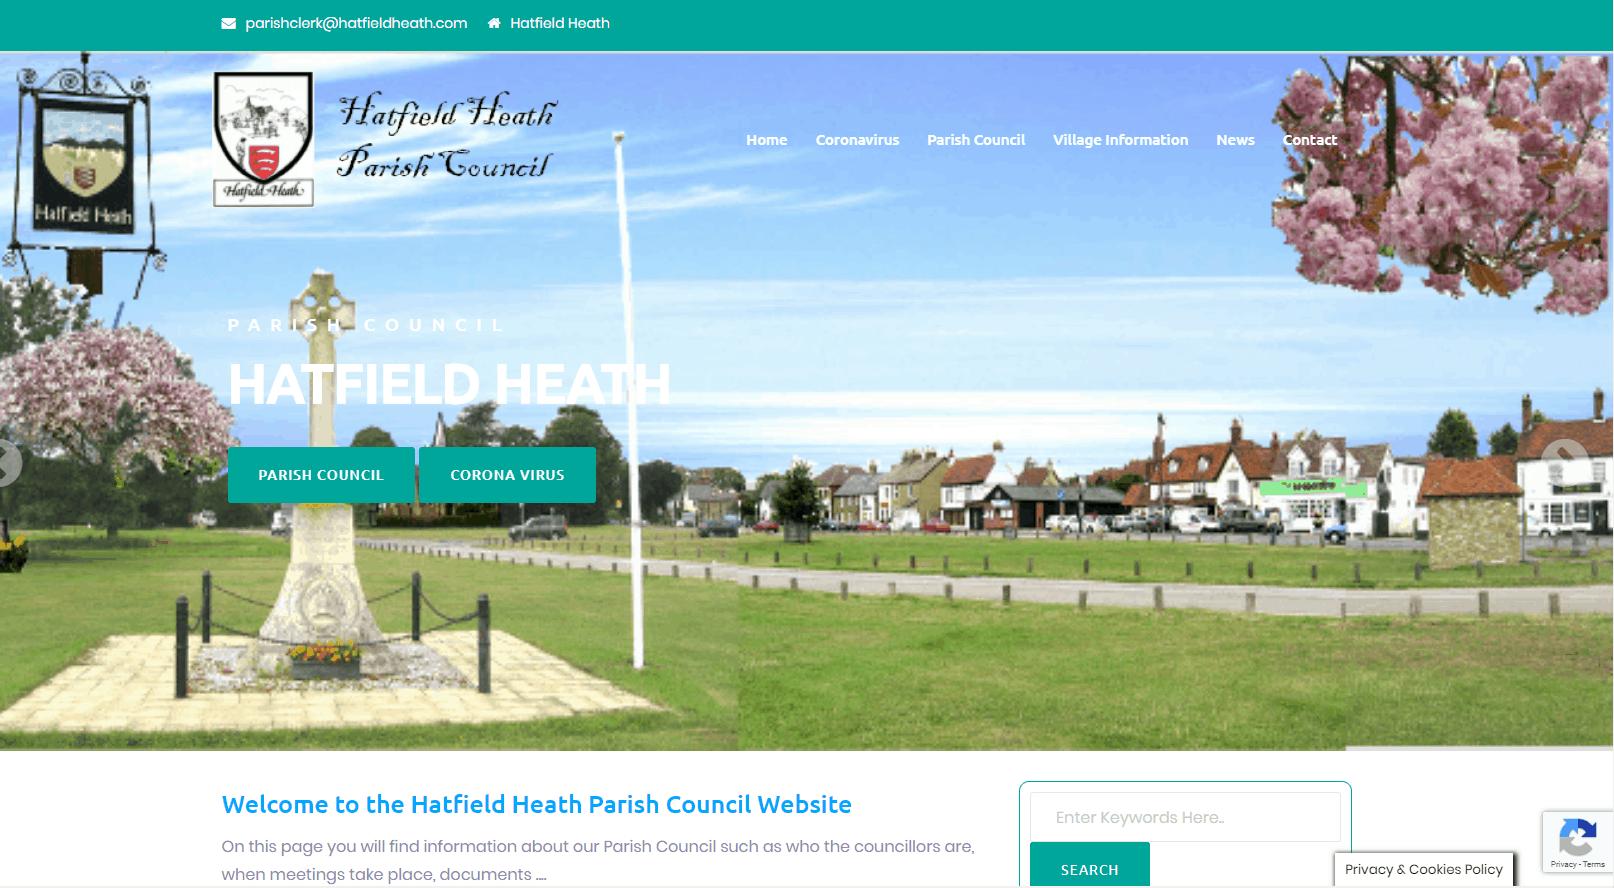 Hatfield Heath Parish Council